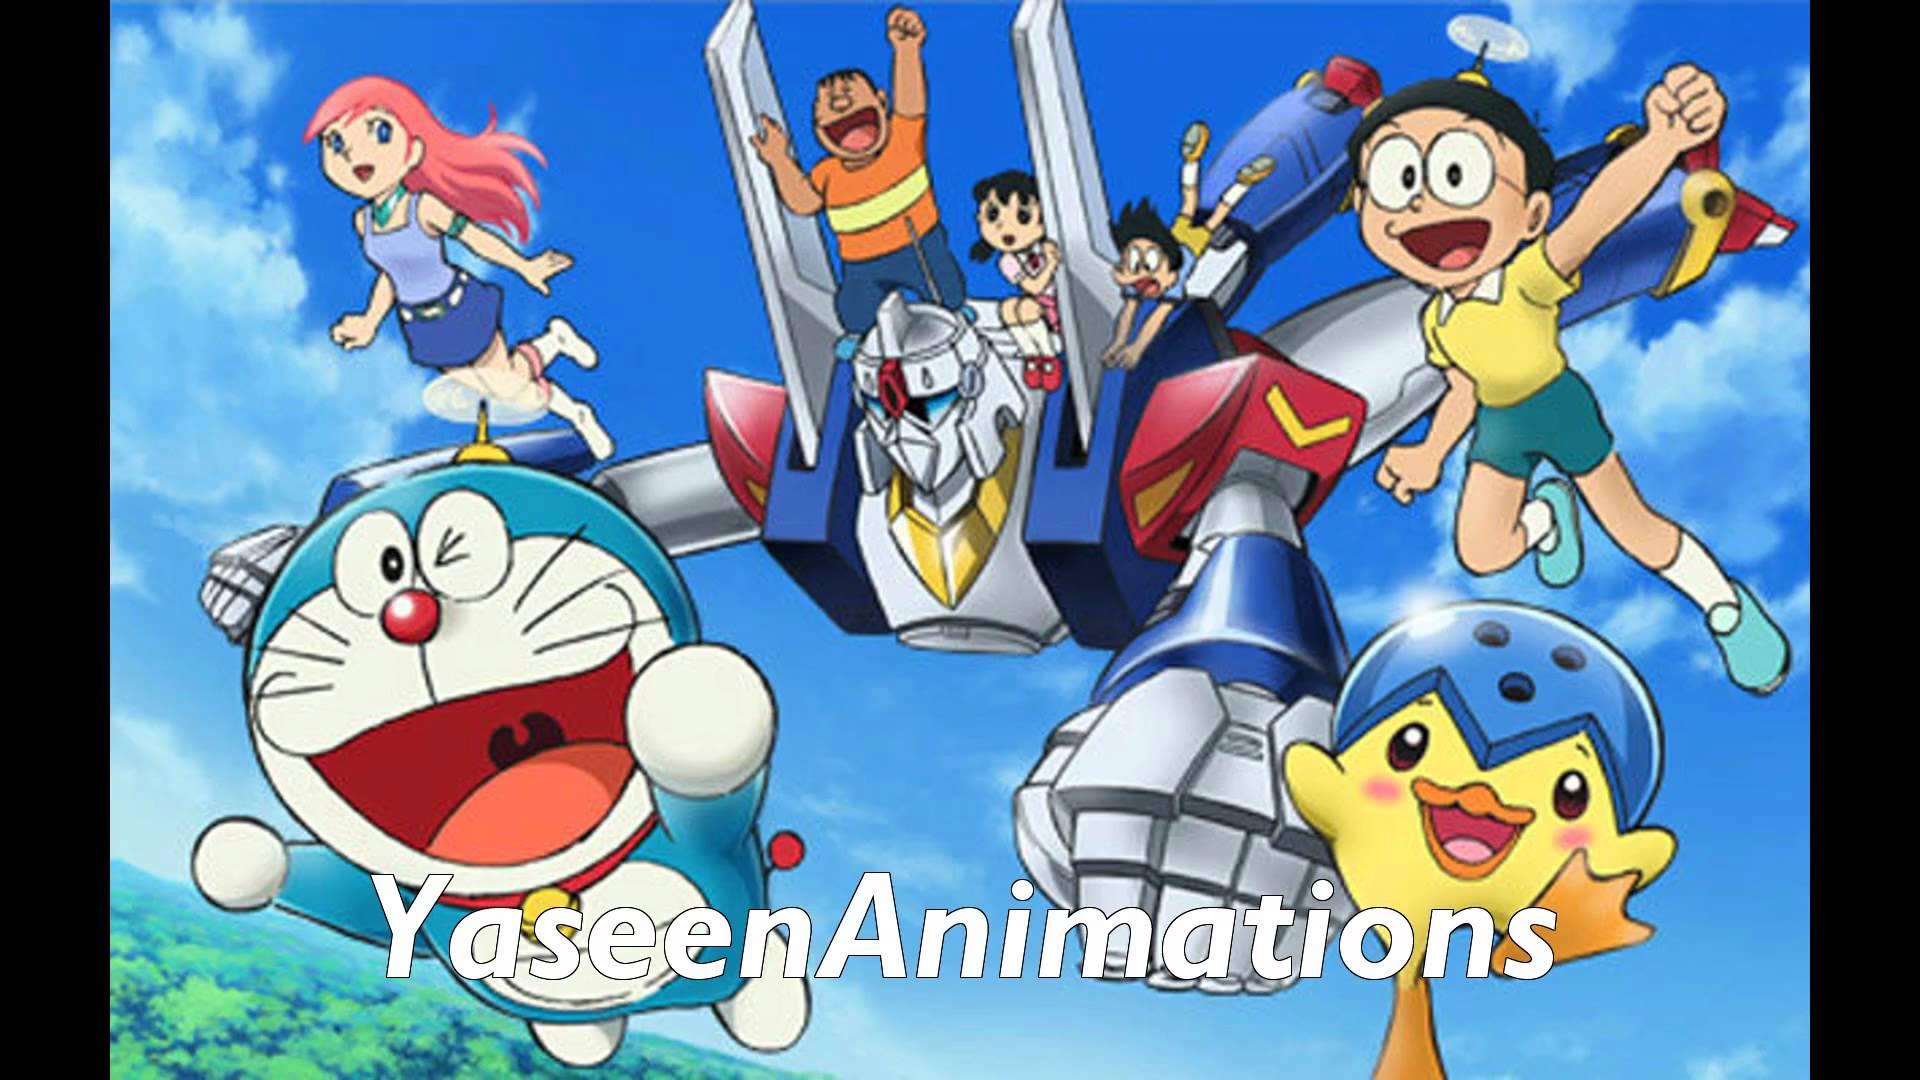 Doraemon 3D Wallpapers 2015 1920x1080